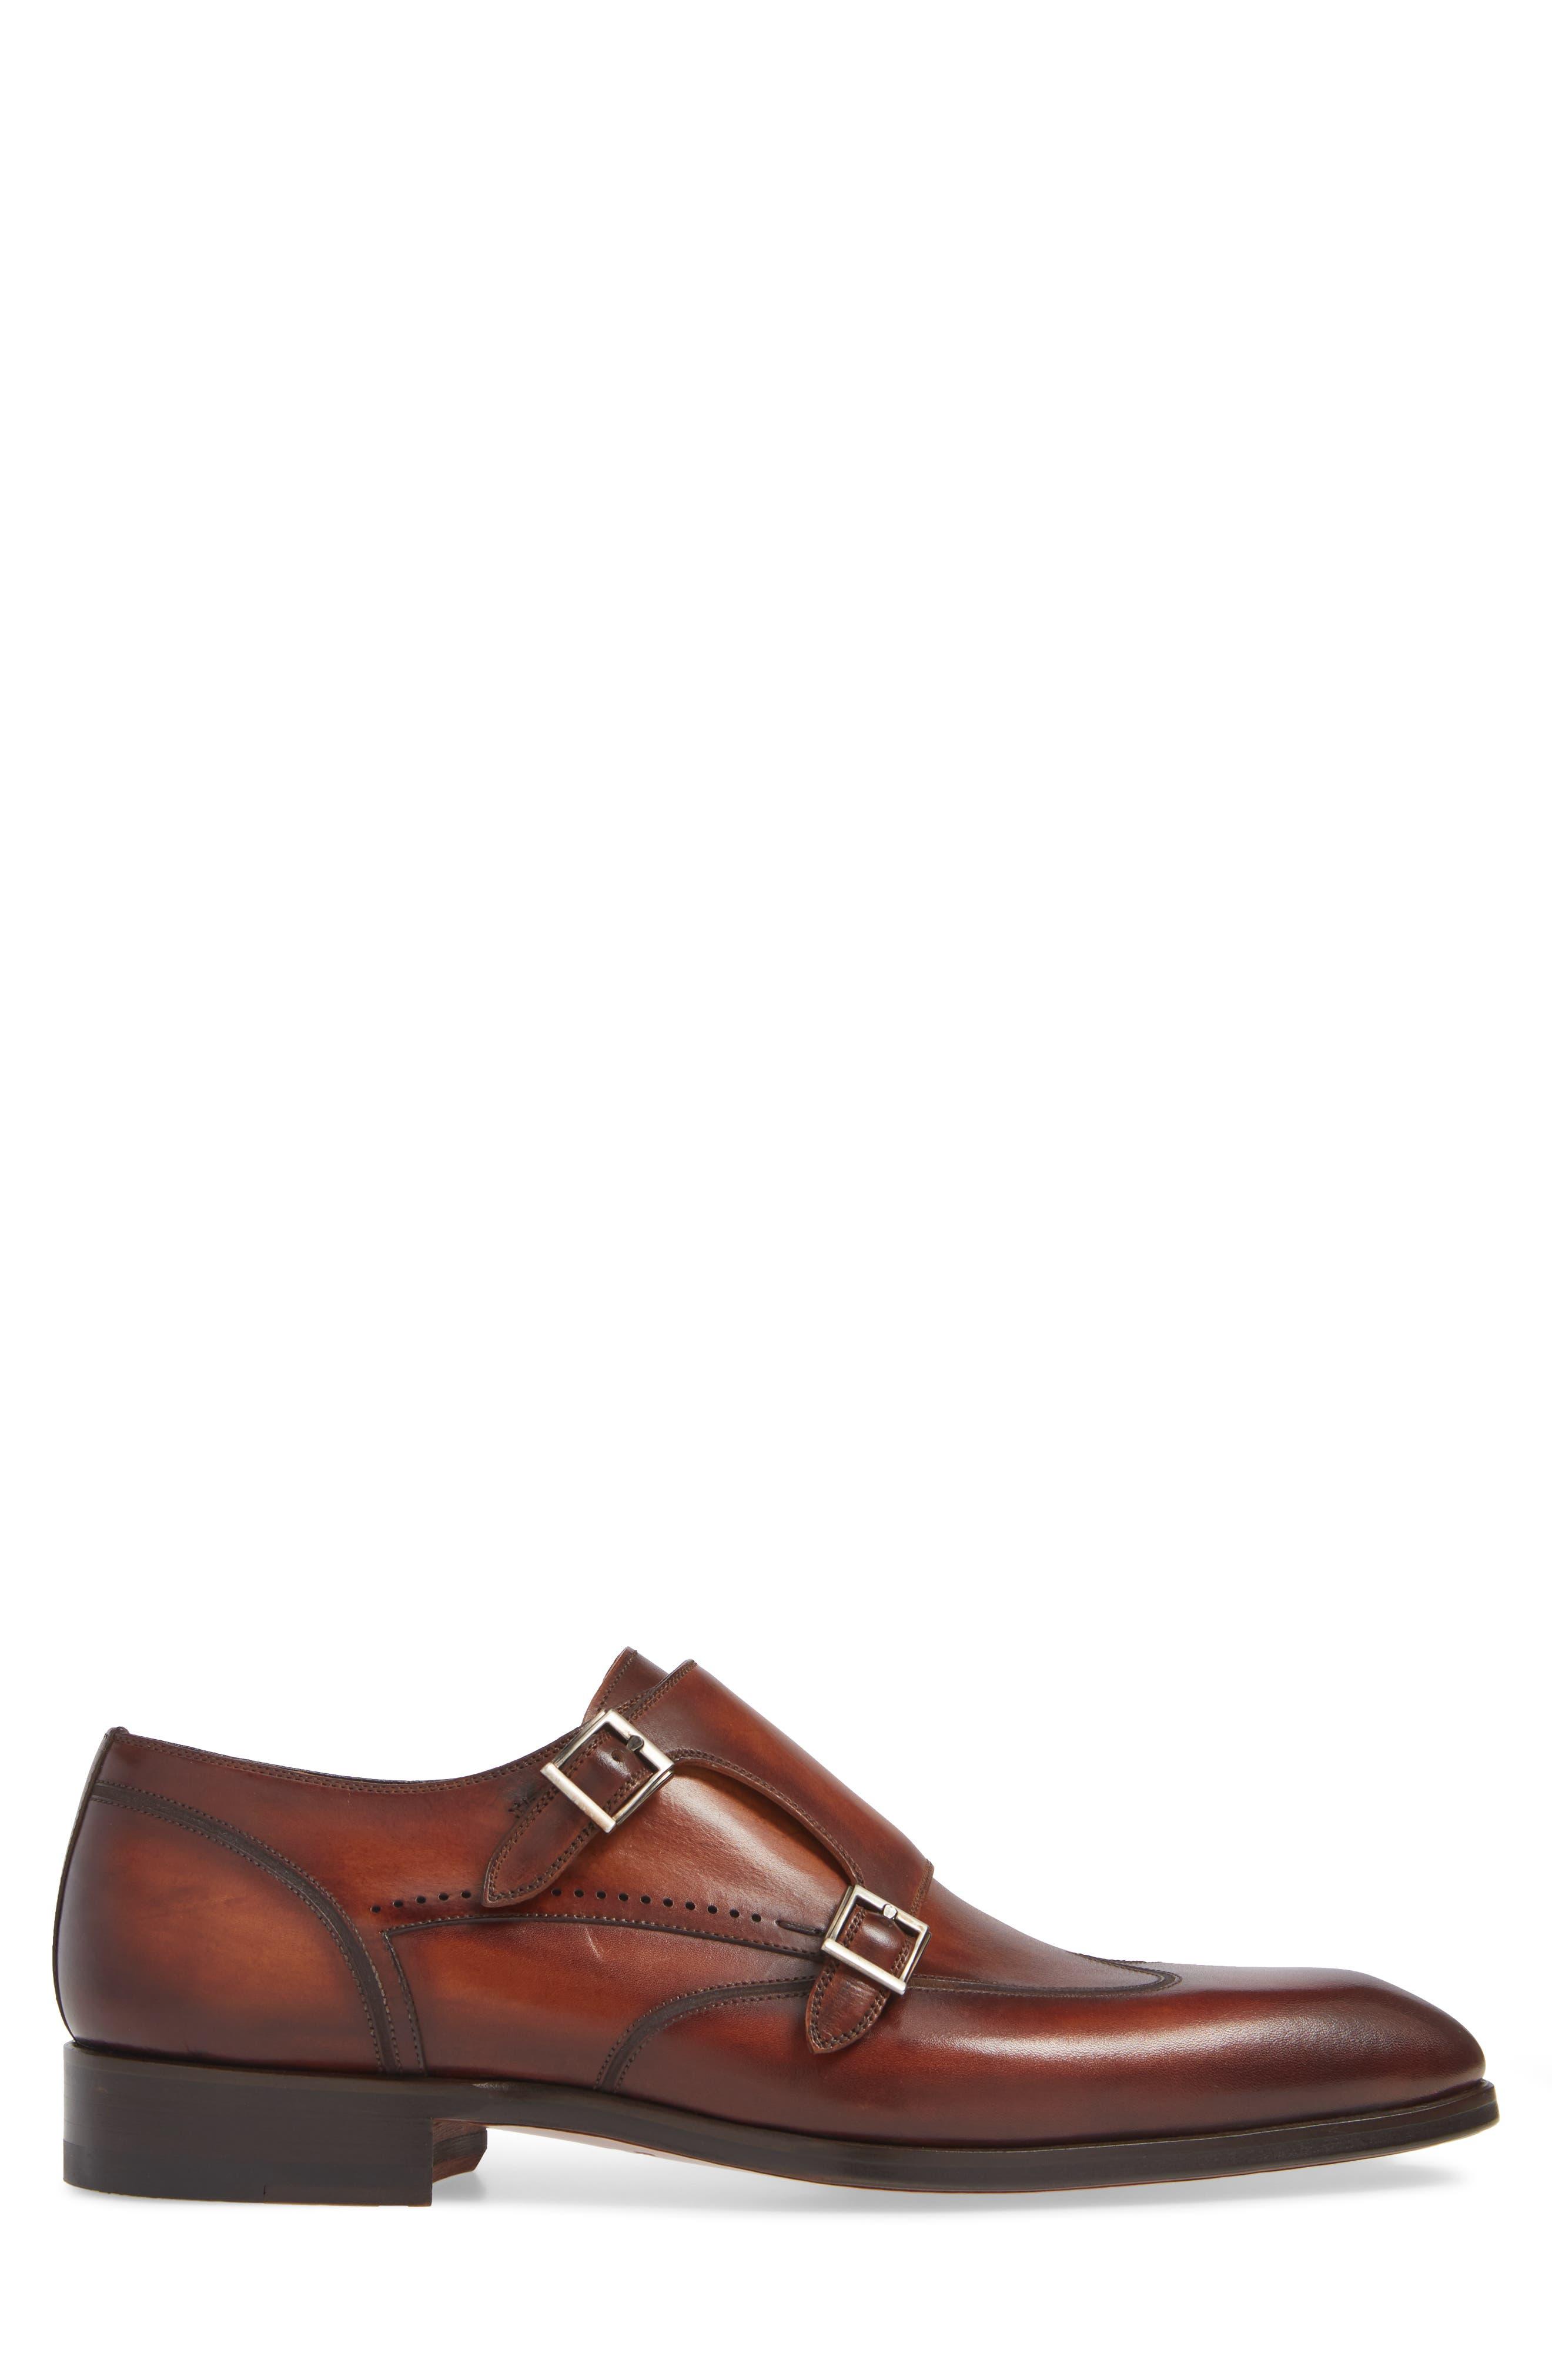 Camden Double Monk Strap Shoe,                             Alternate thumbnail 3, color,                             202